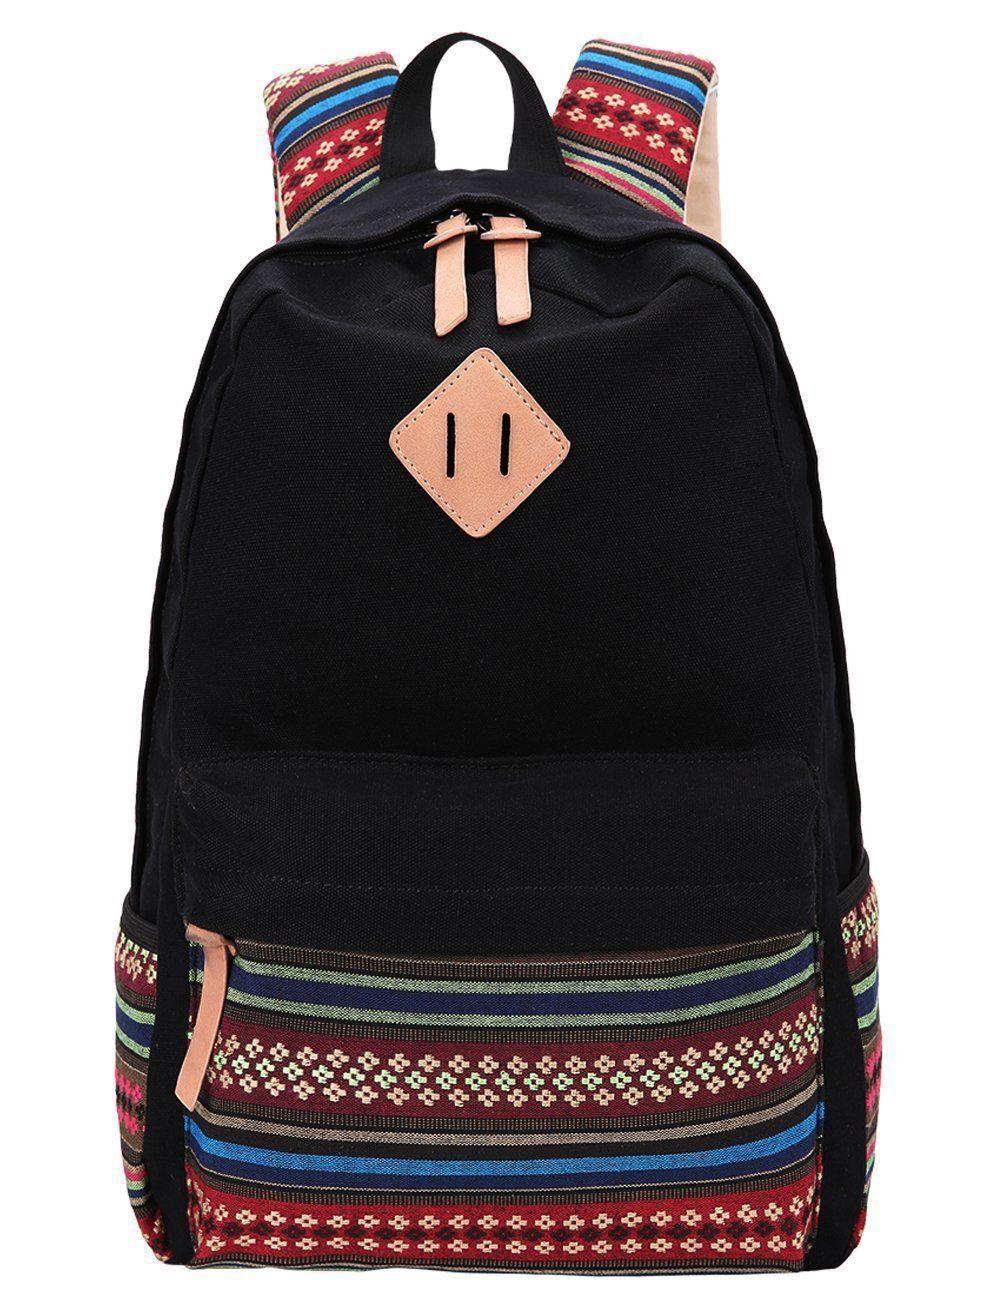 4ac3b3376d5 Hmxpls Unisex Fashionable Canvas Zip Bohemia Boho Style Backpack School  College Laptop Bag for Teens Girls Boys Students, Black